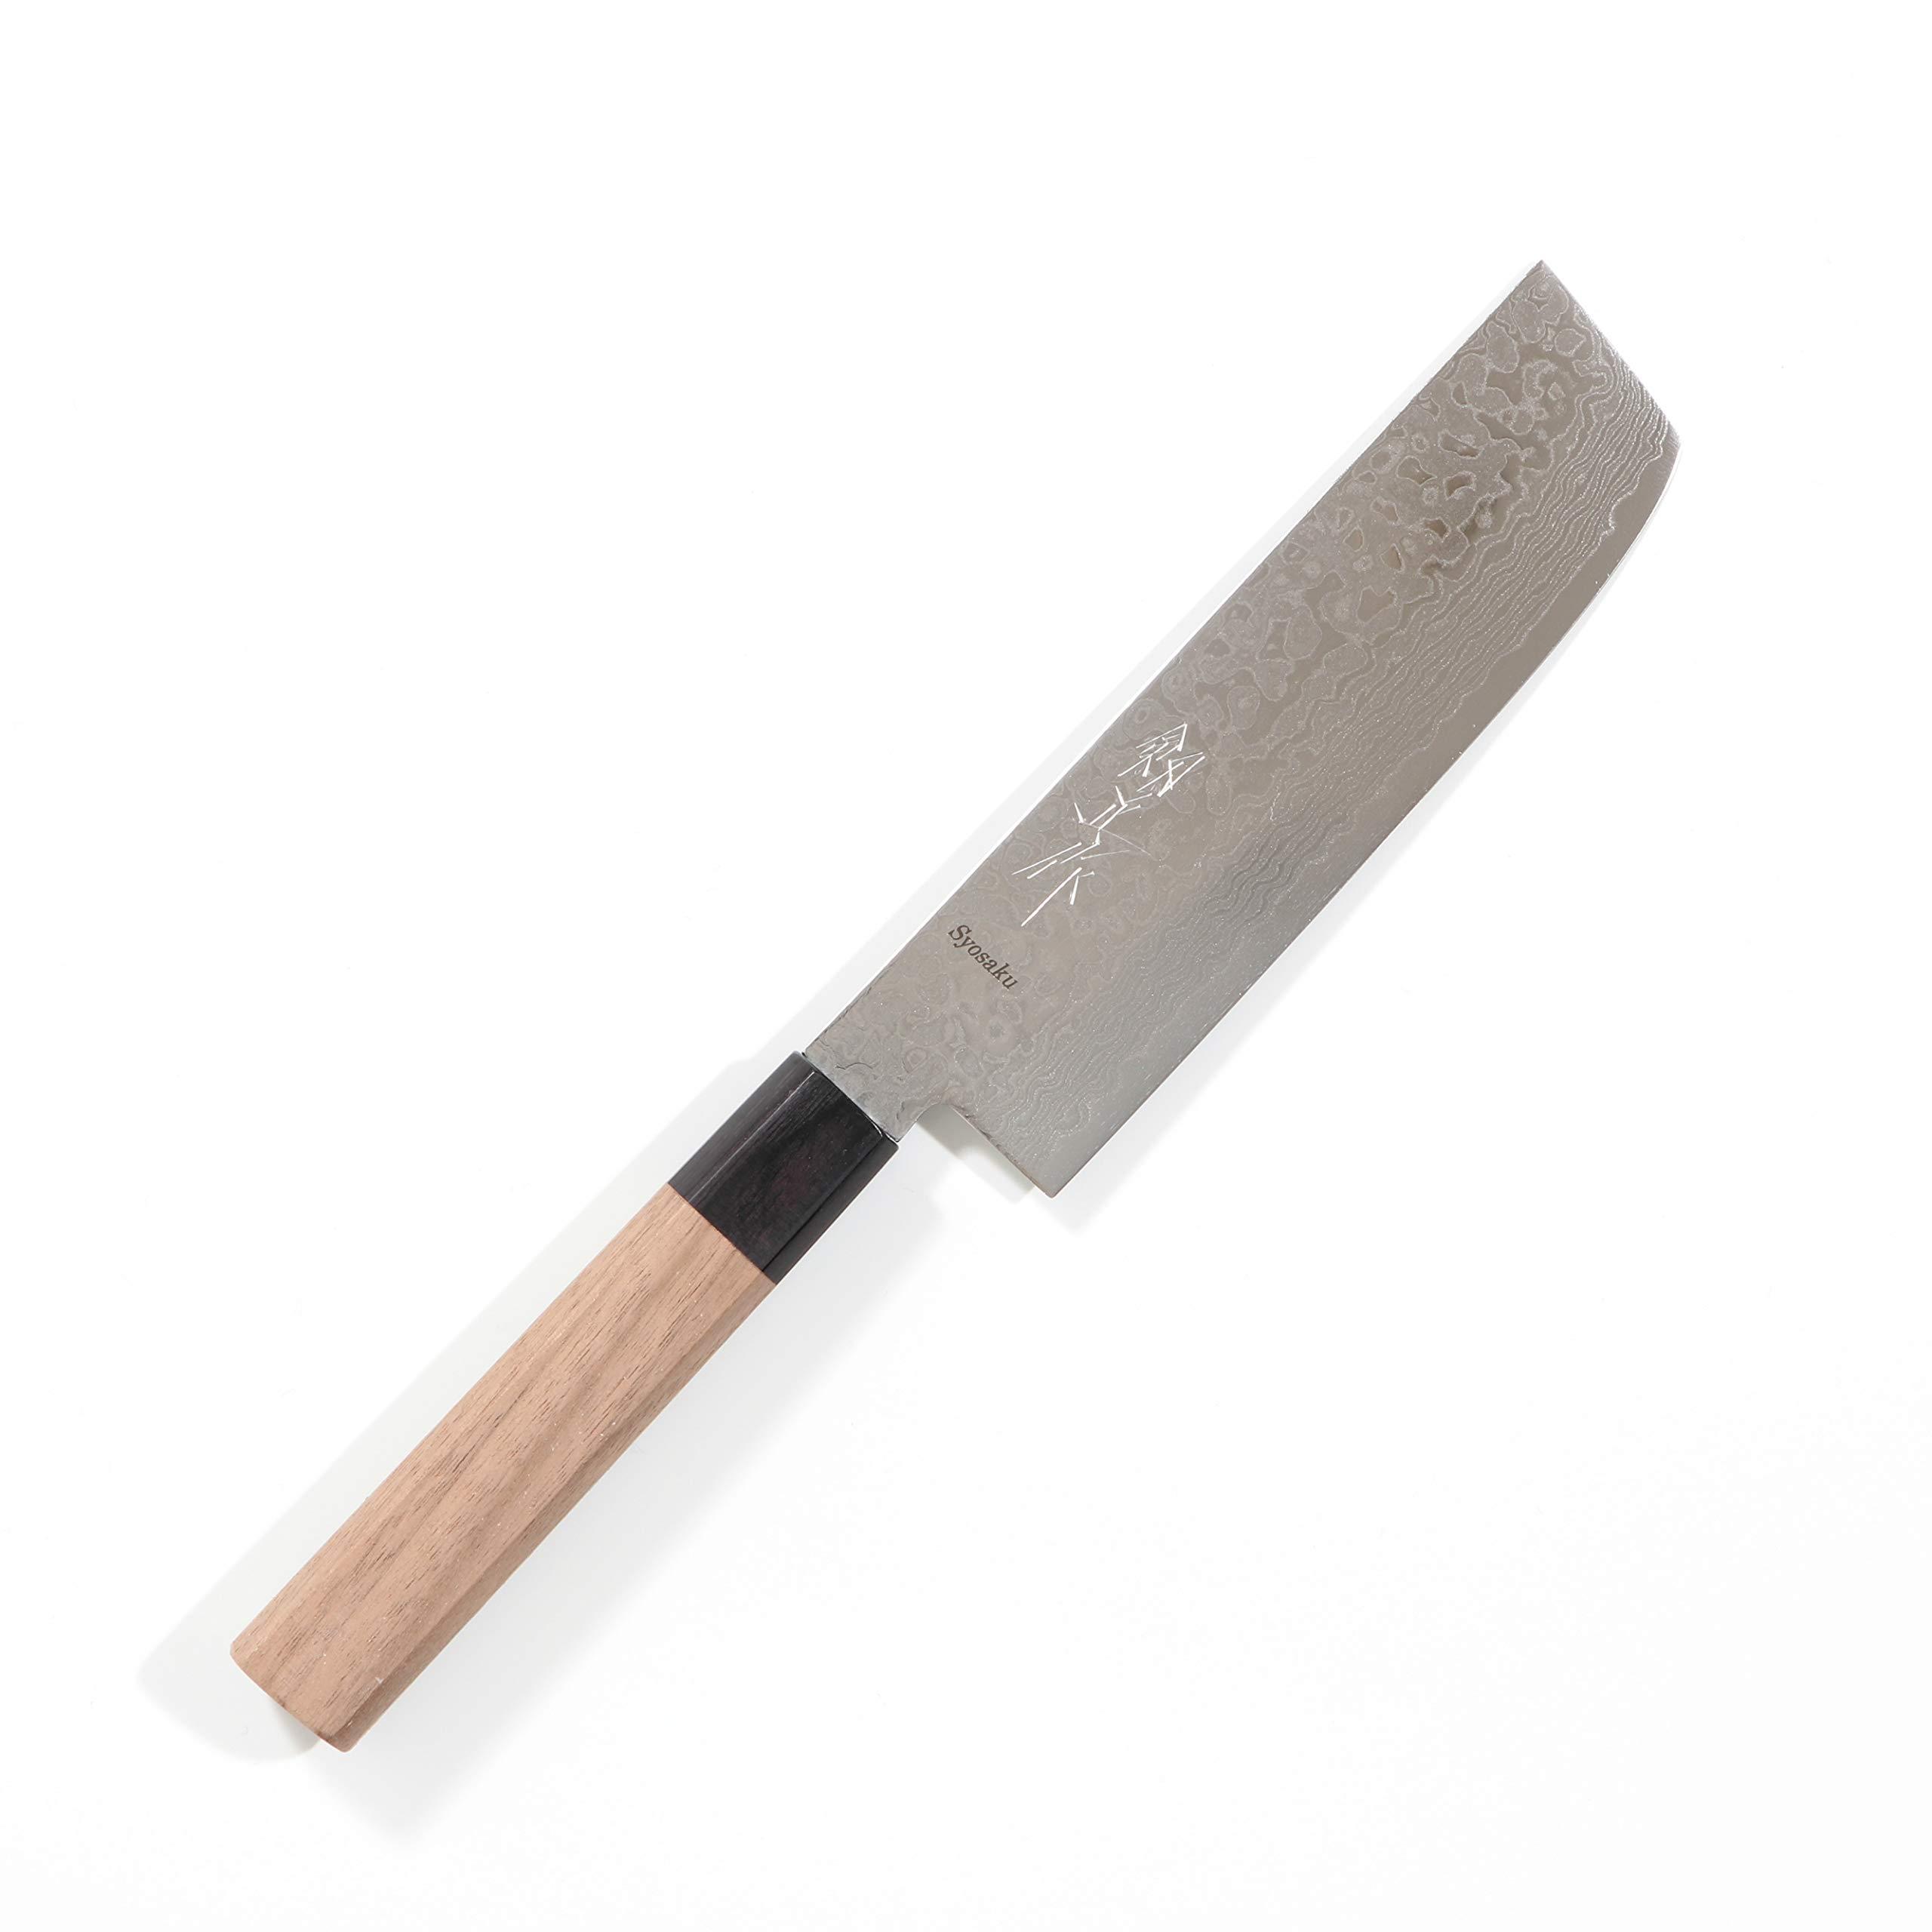 Syosaku Japan Vegetable Knife Damascus ZA18 69 Layer Octagonal Walnut Handle, Nakiri 6.3-inch (160mm)